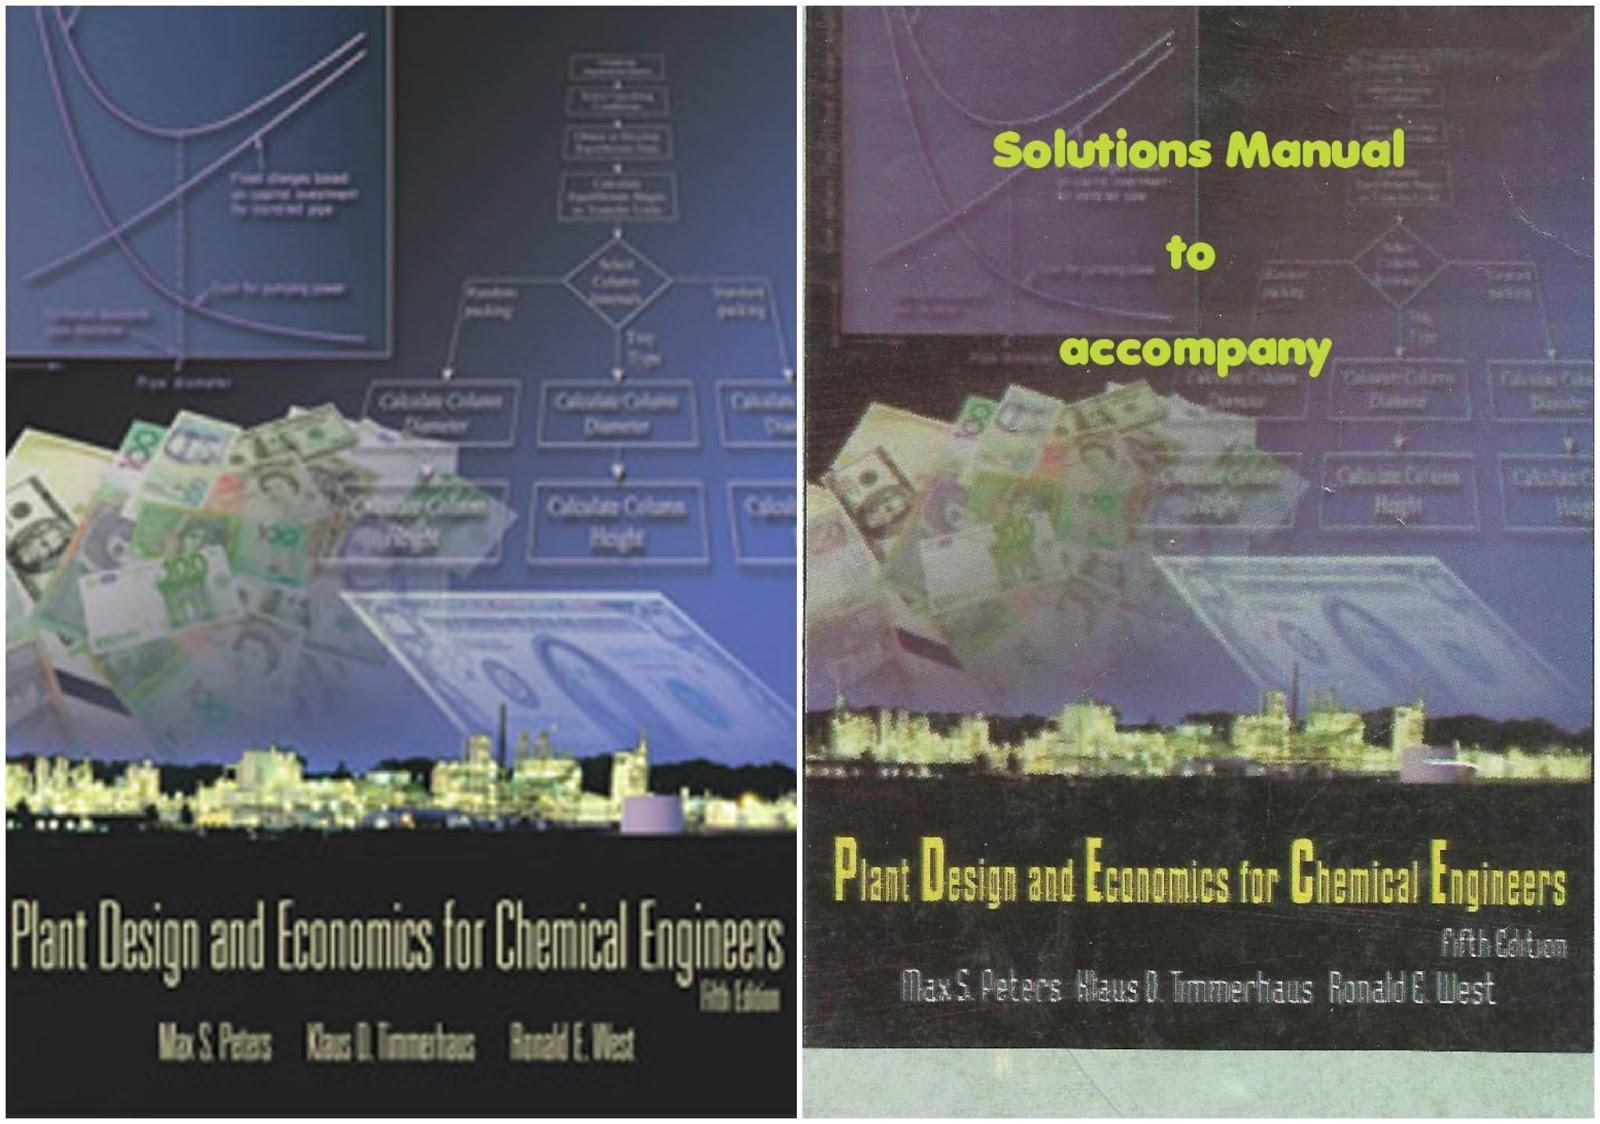 Engineering Library Ebooks June 2018